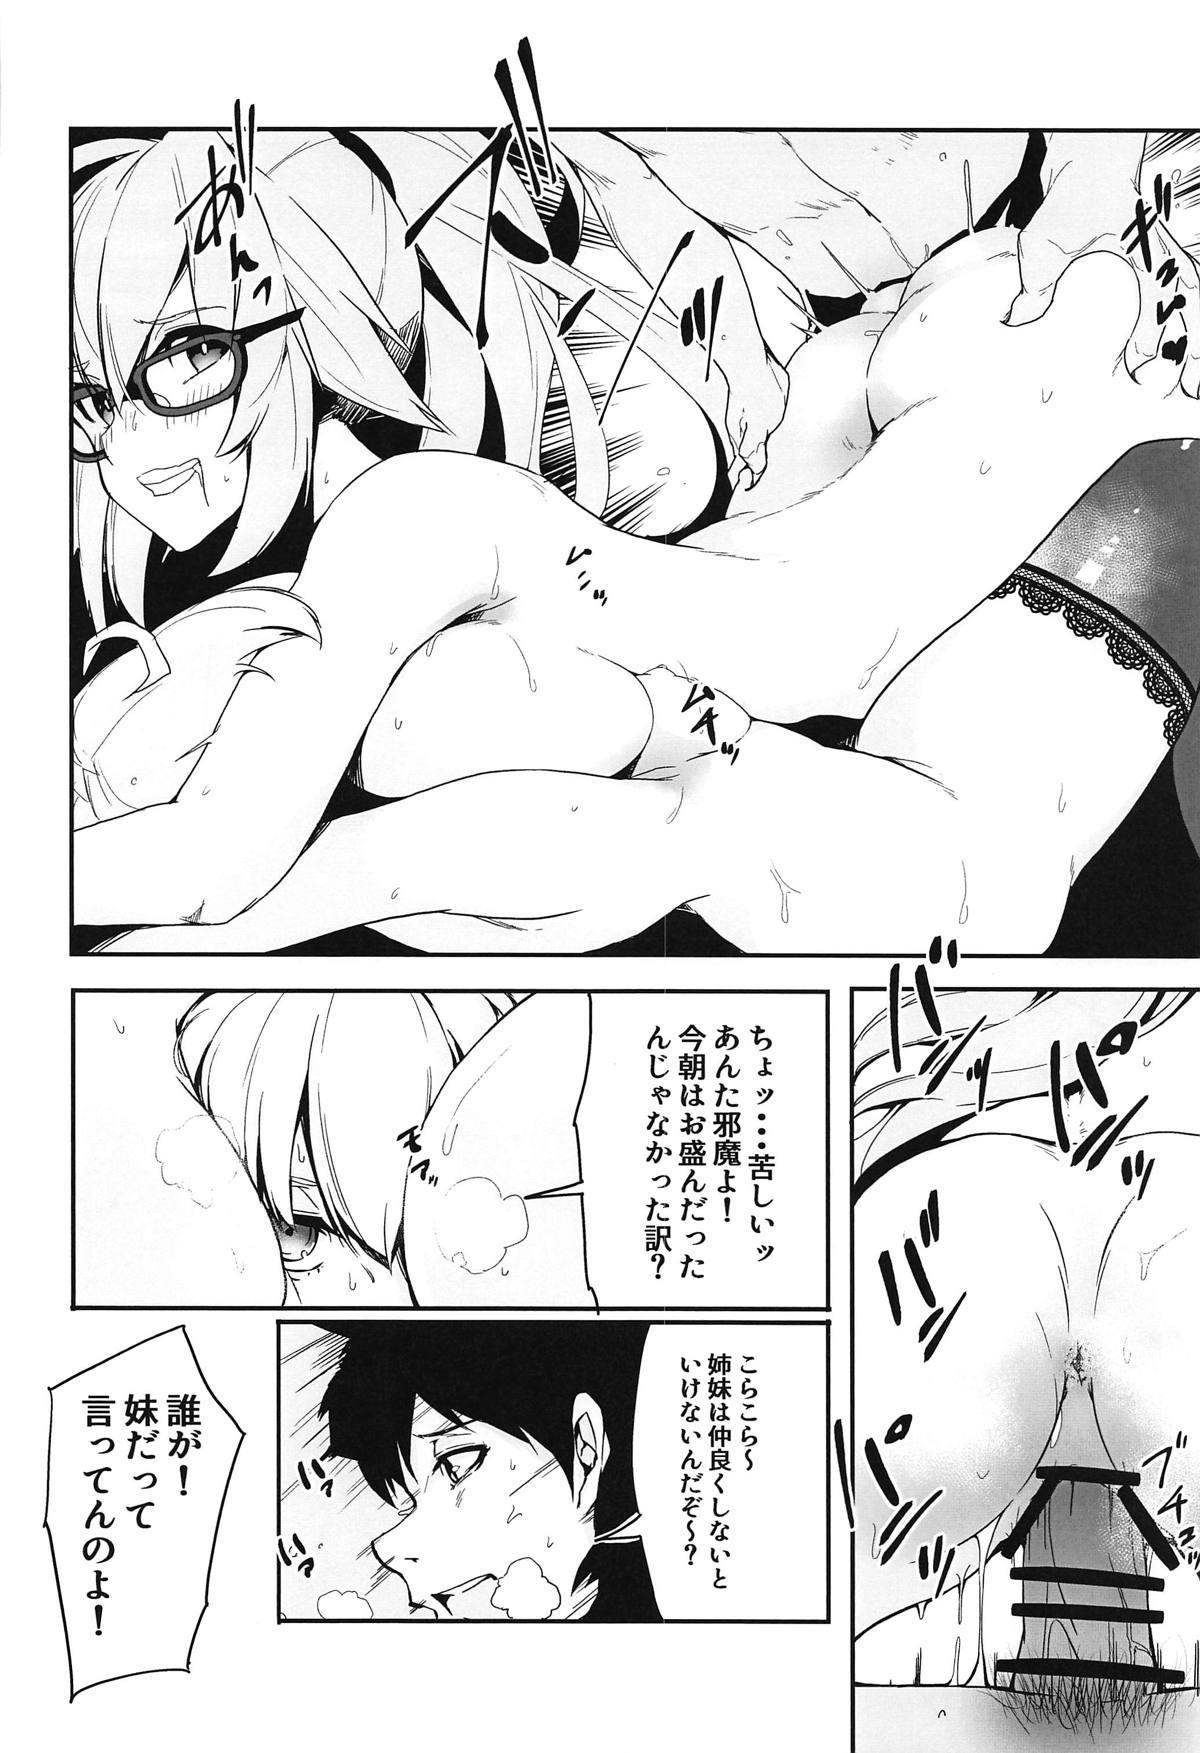 Double Jeanne to Shiawase 3P Luluhawa Seikatsu 18